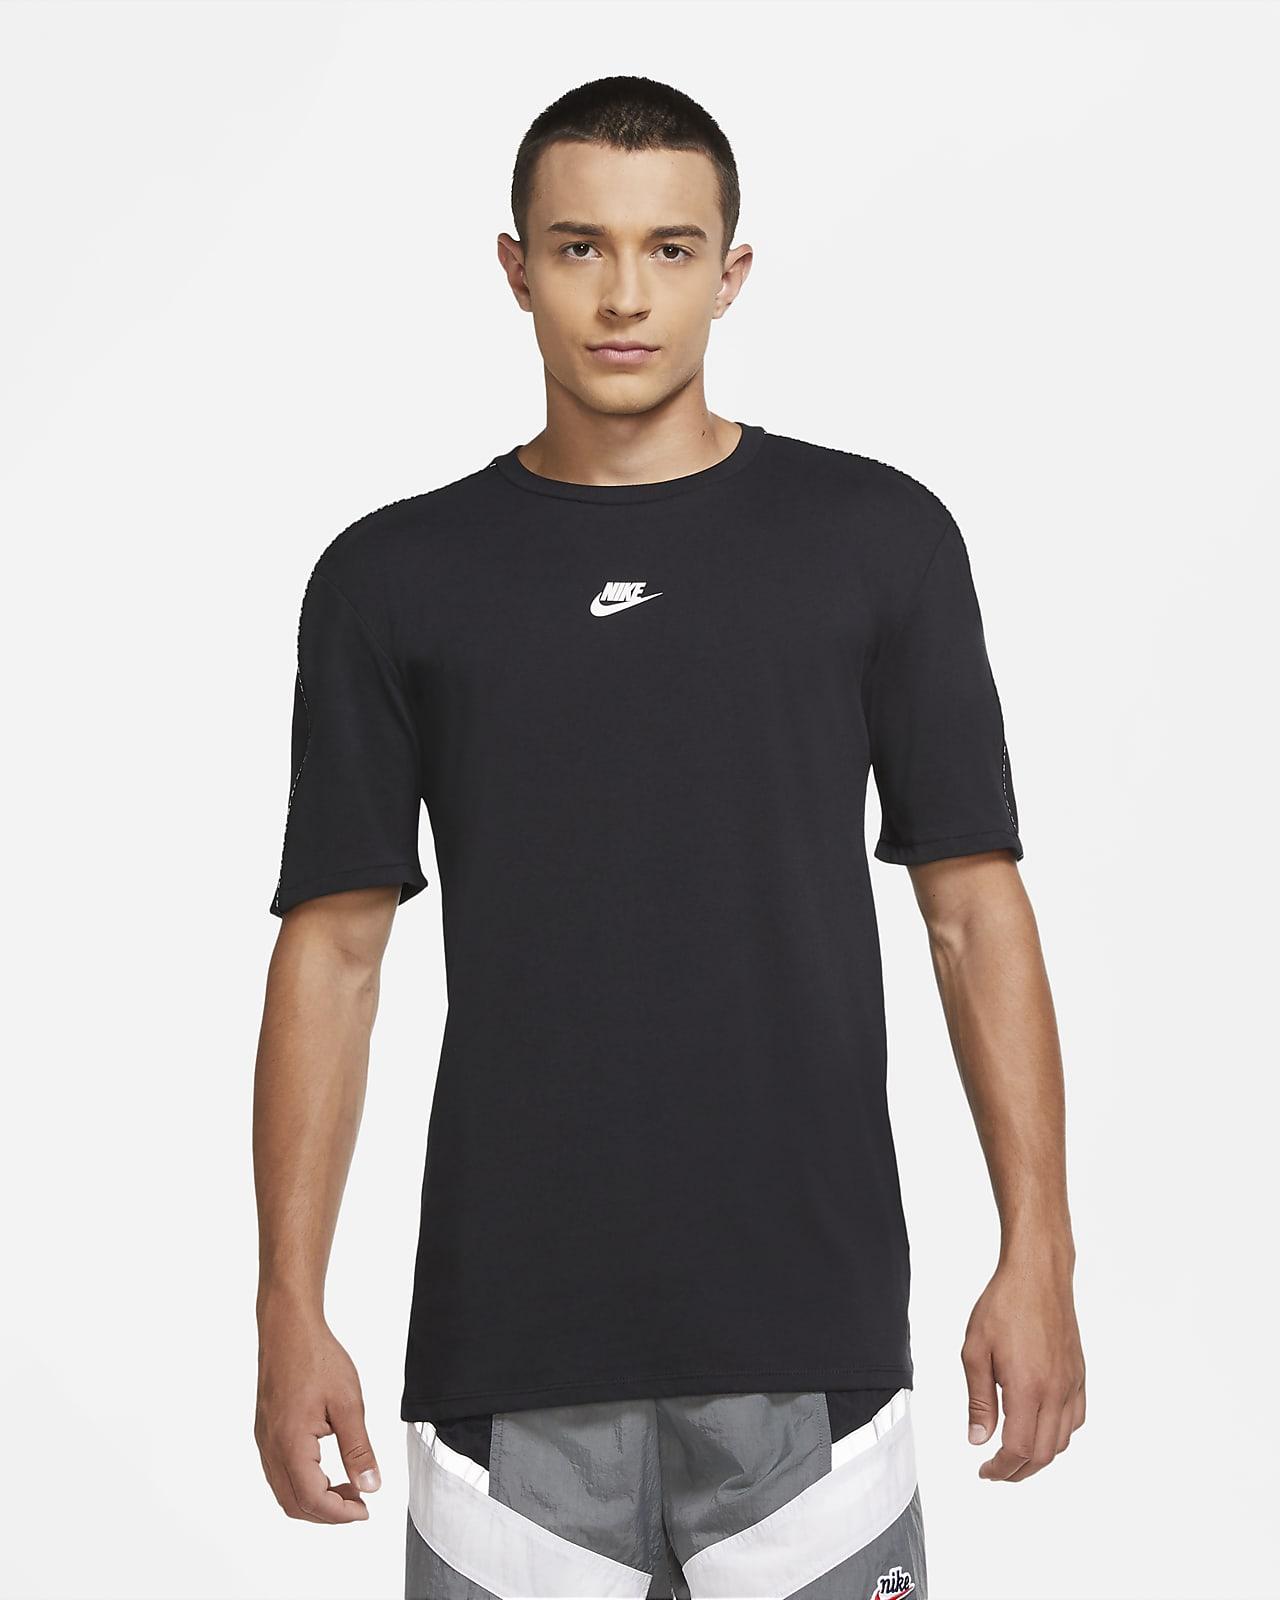 Nike Sportswear 男款短袖上衣